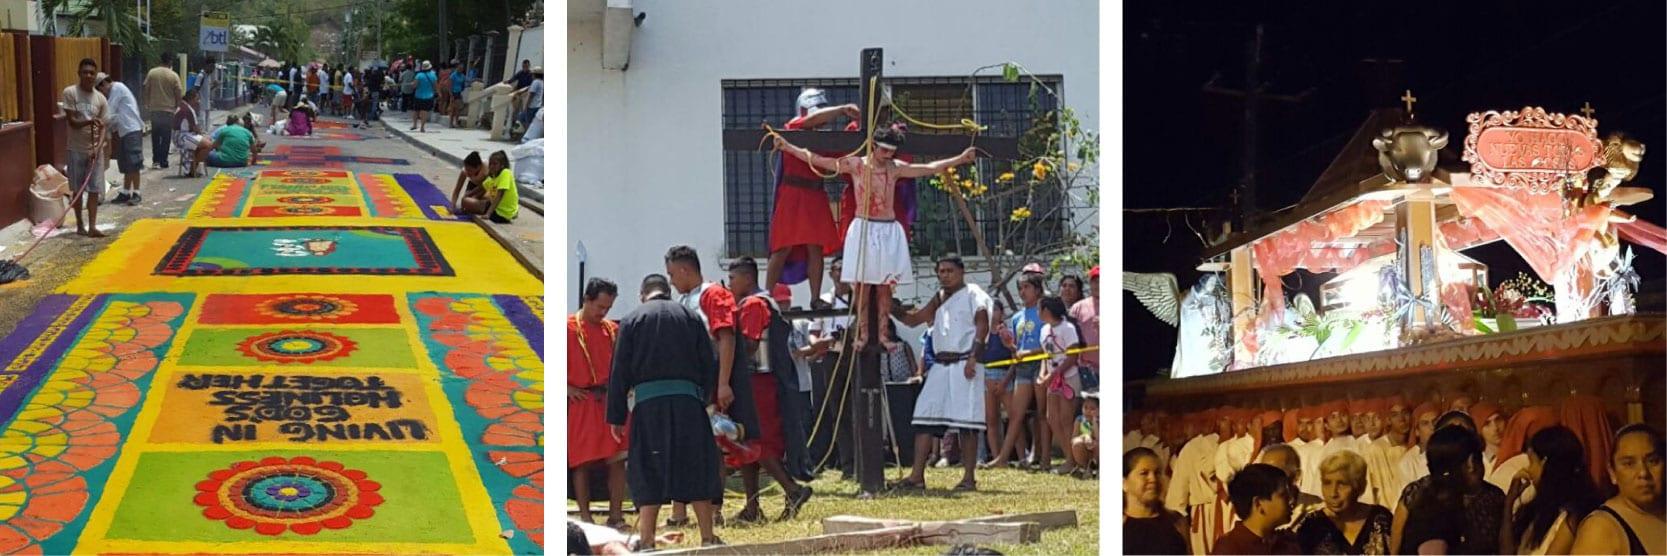 Easter, Belize, Beque Viejo, Caribbean Culture, Lifestyle